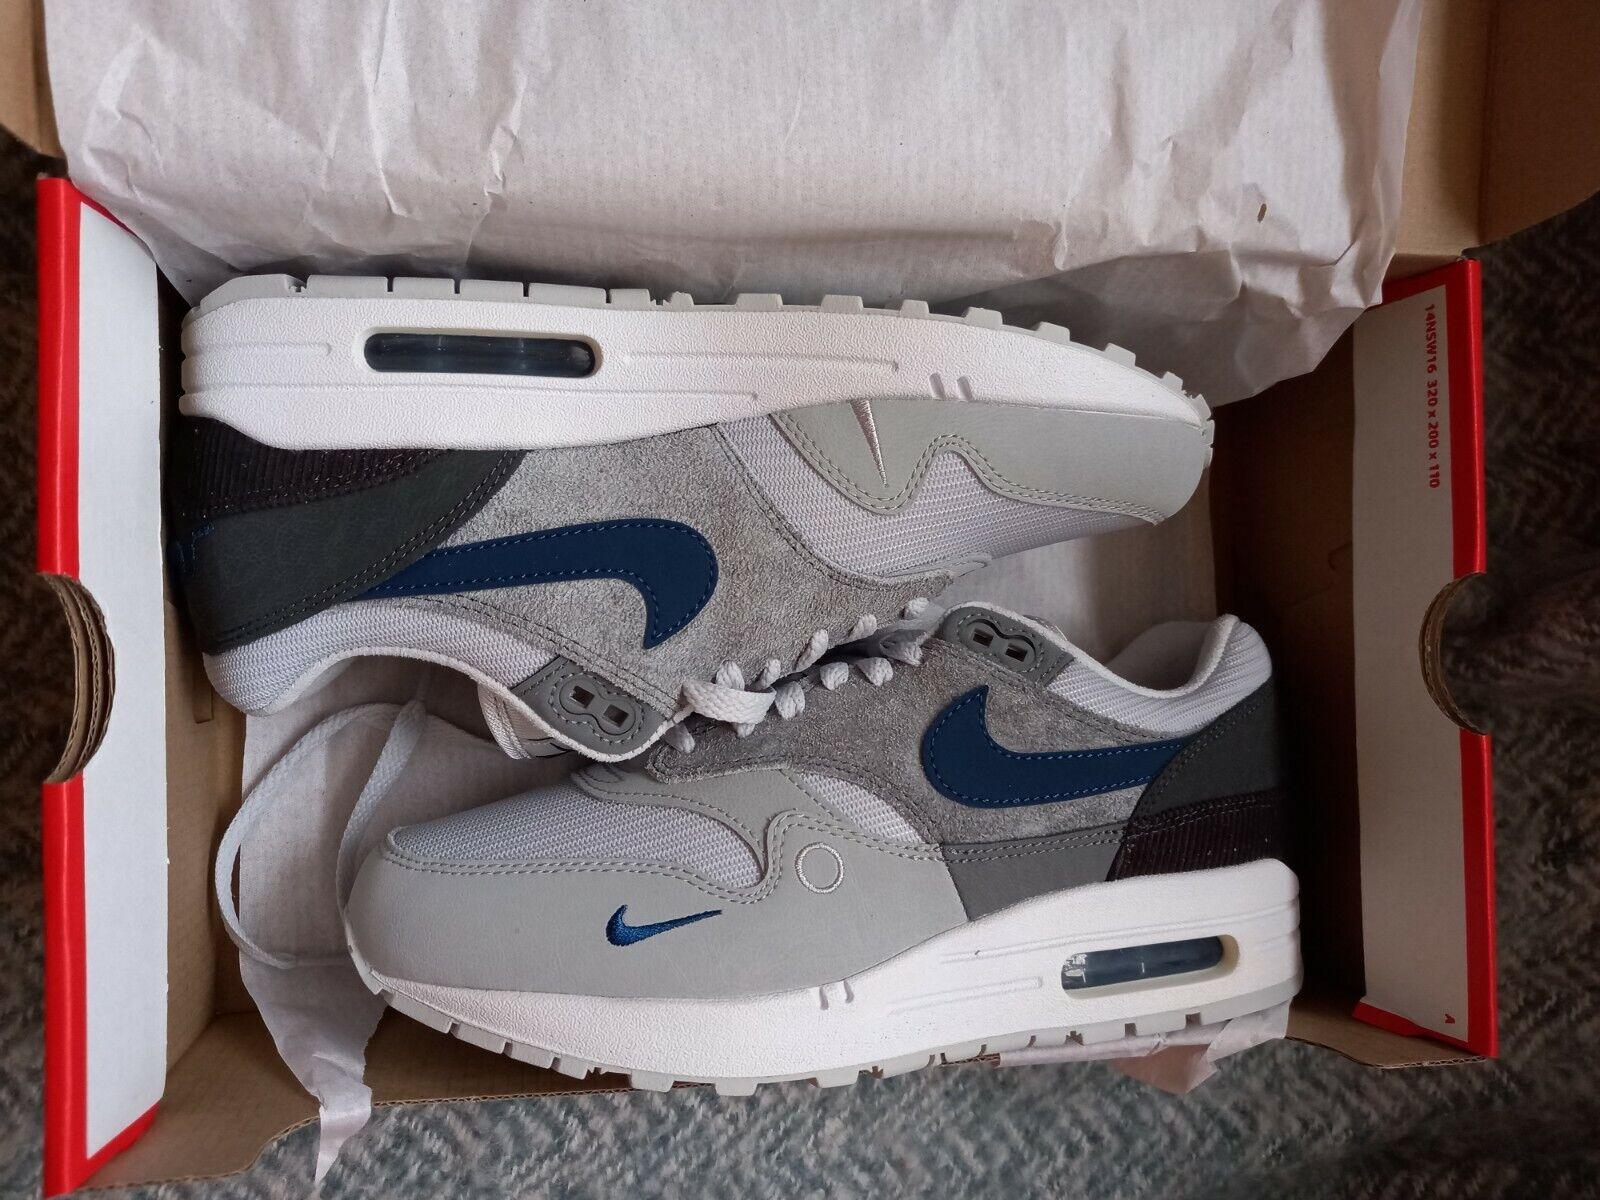 Nike Air Max 1 LONDON / UK 6 / New with box / Smoke Grey / Valerian Blue